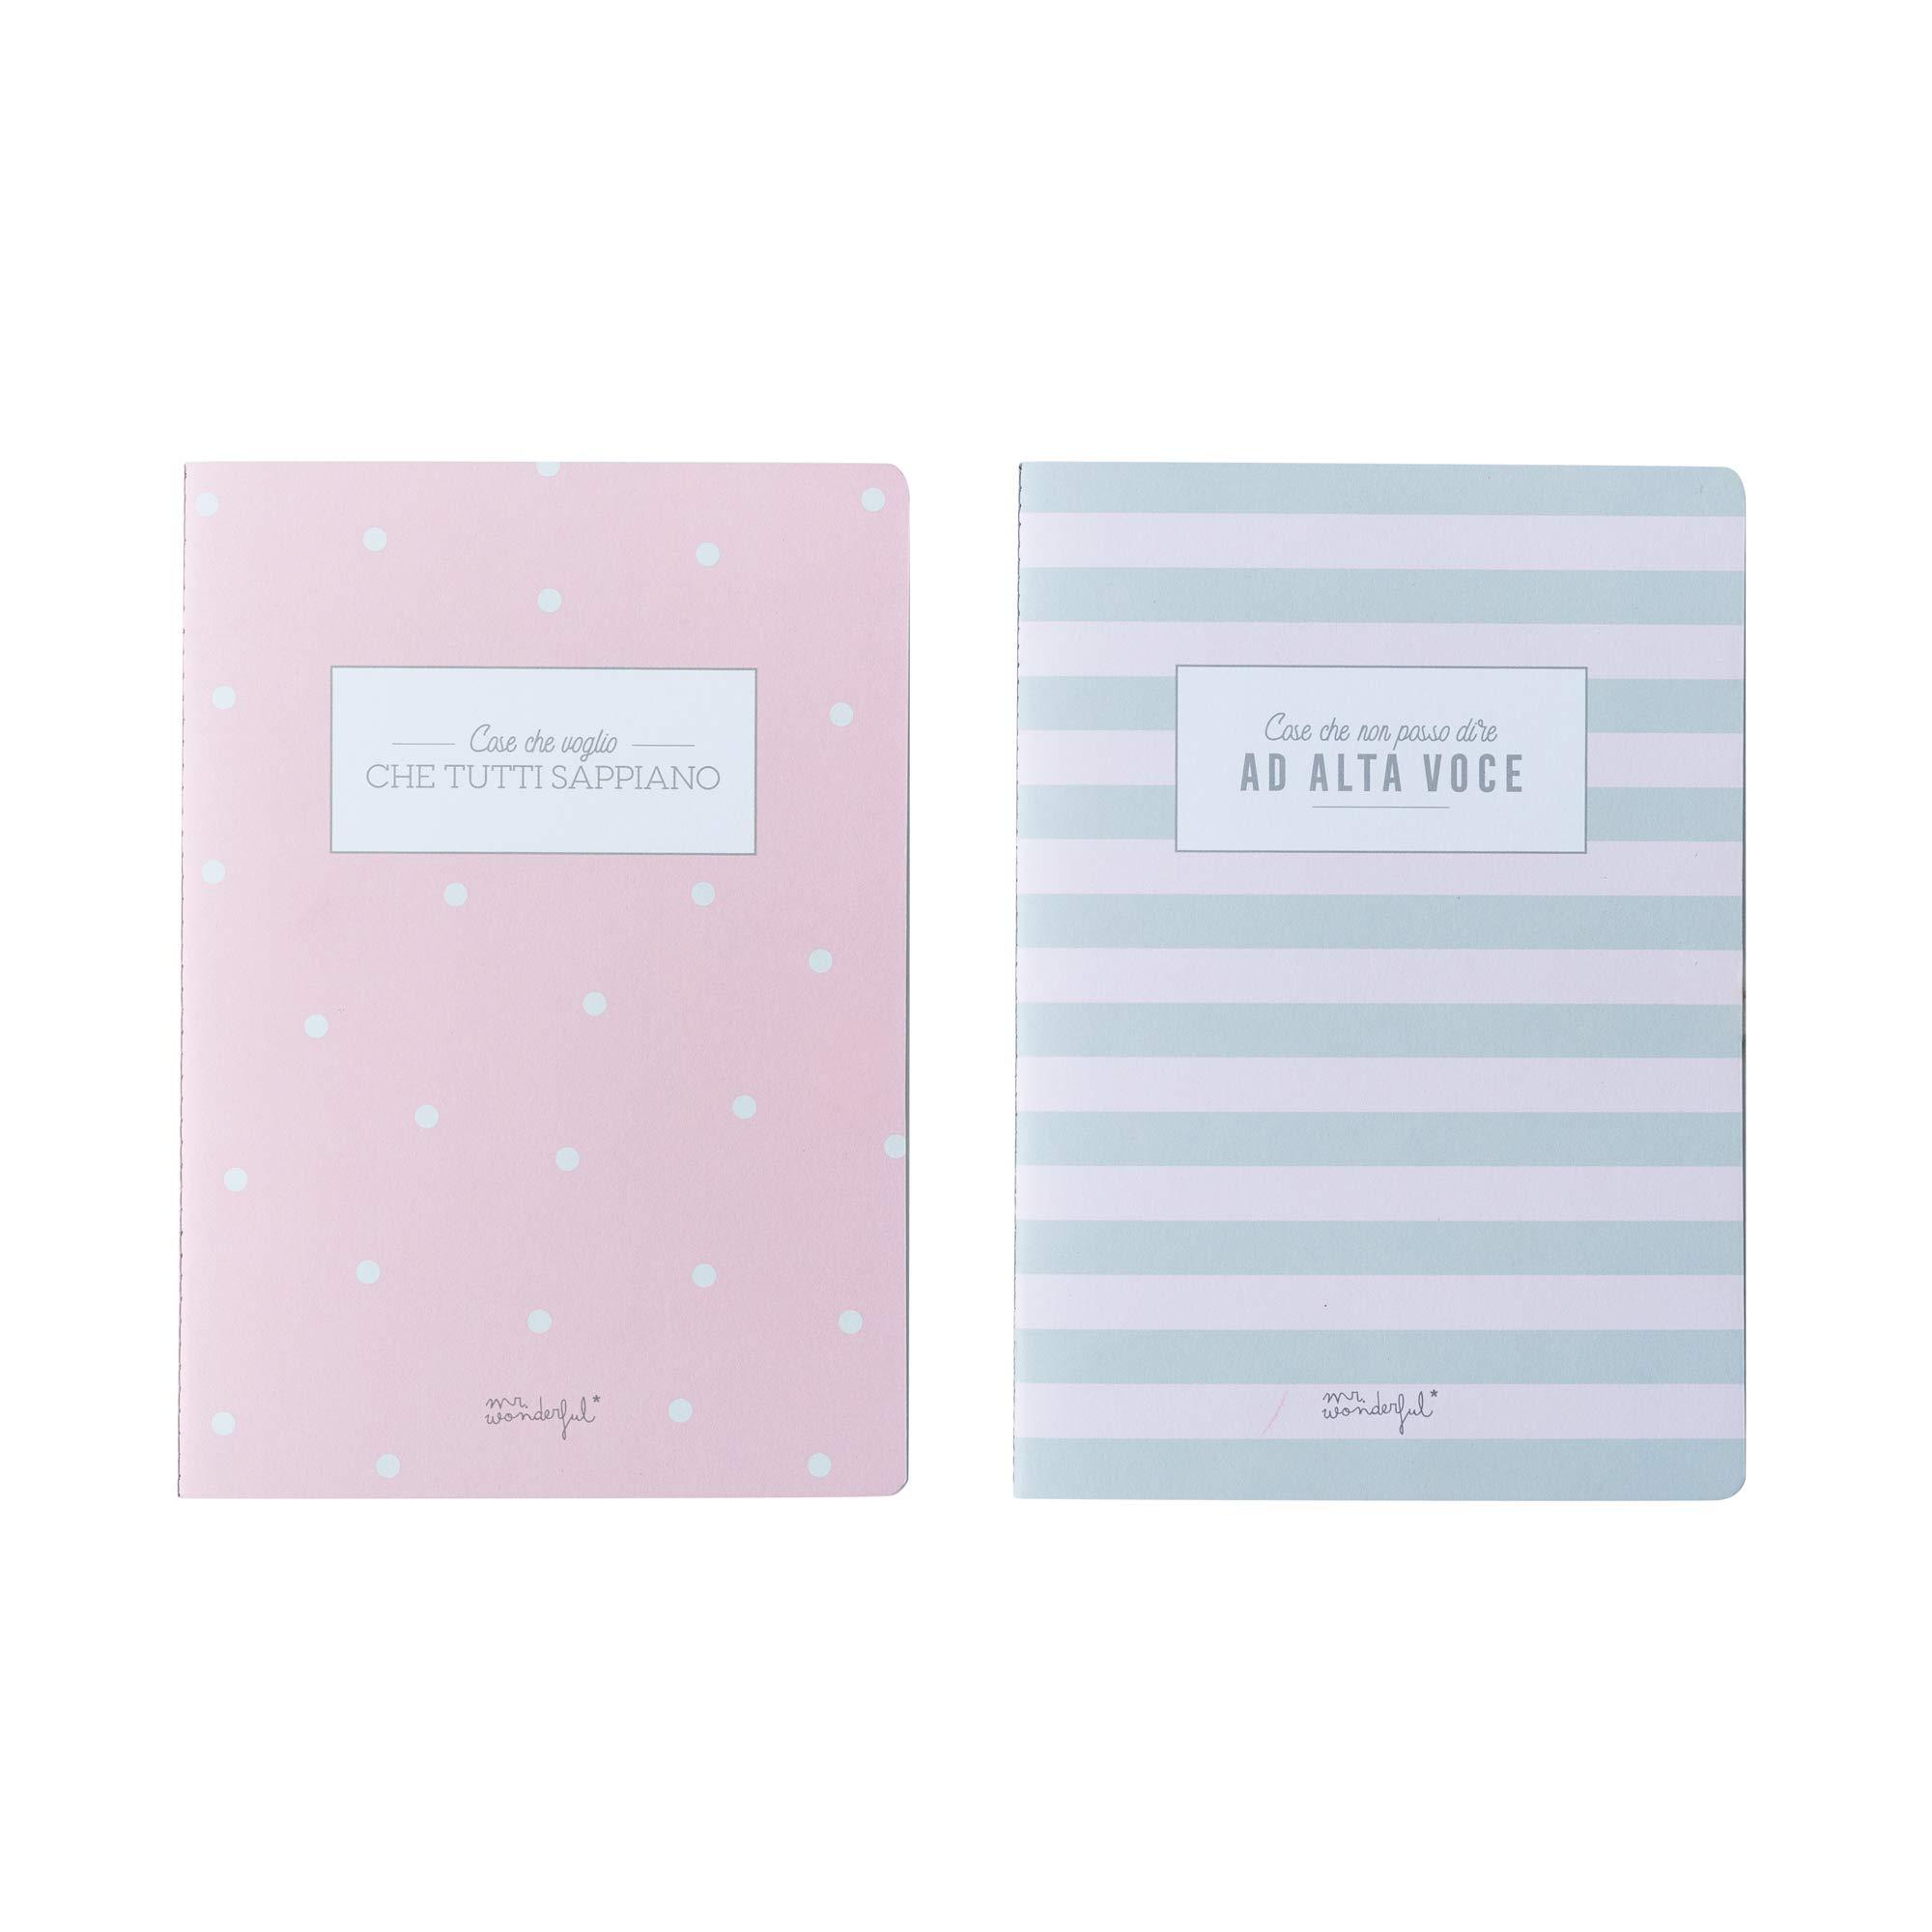 Mr. Wonderful WOA09177IT Set of 2 Notebooks by Mr. Wonderful (Image #1)